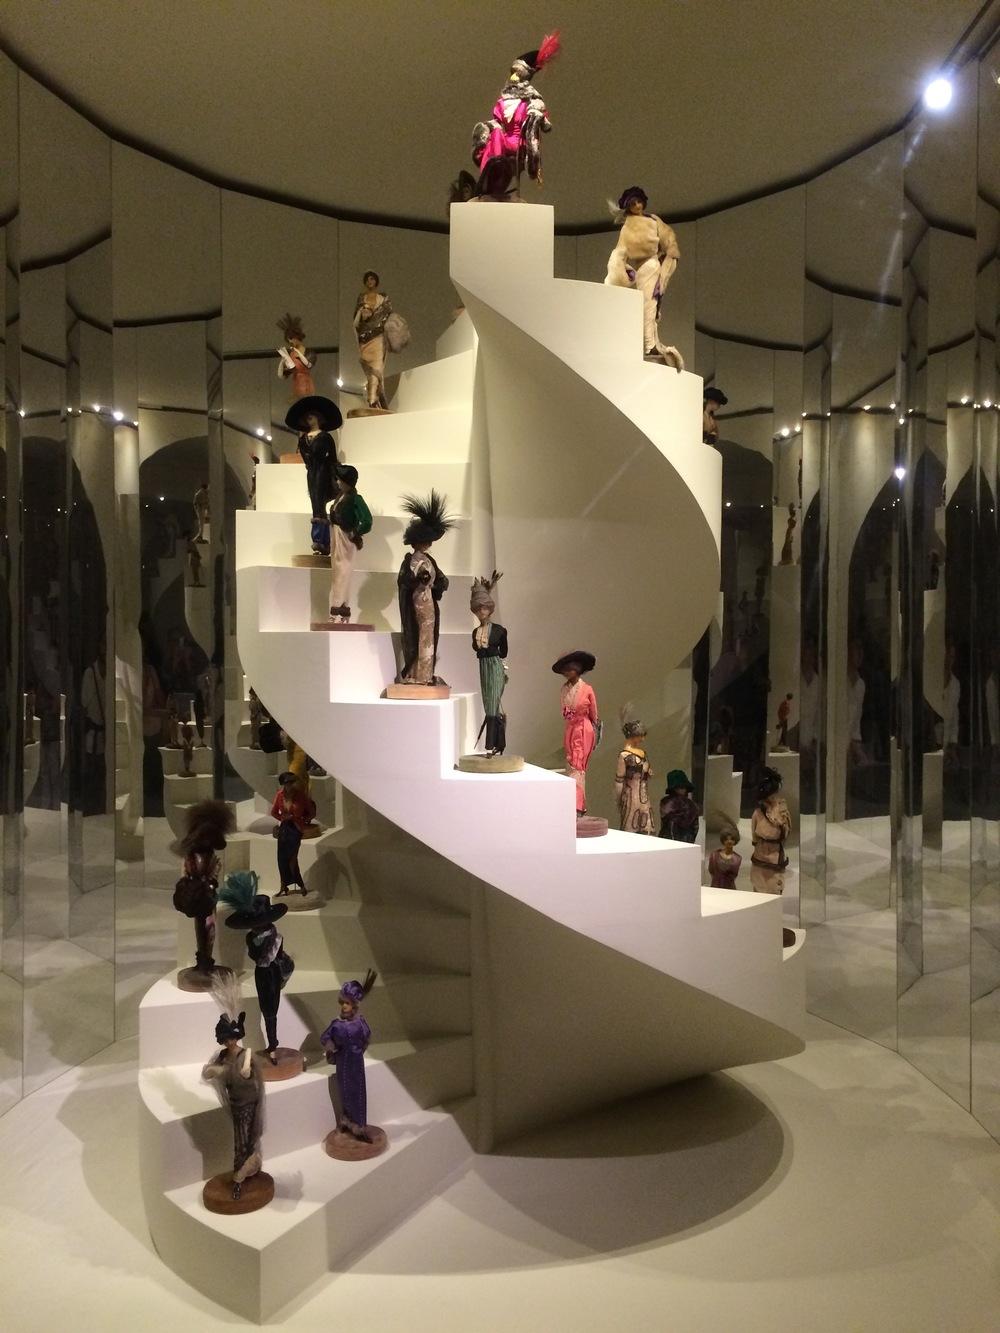 Stairway of Dolls!